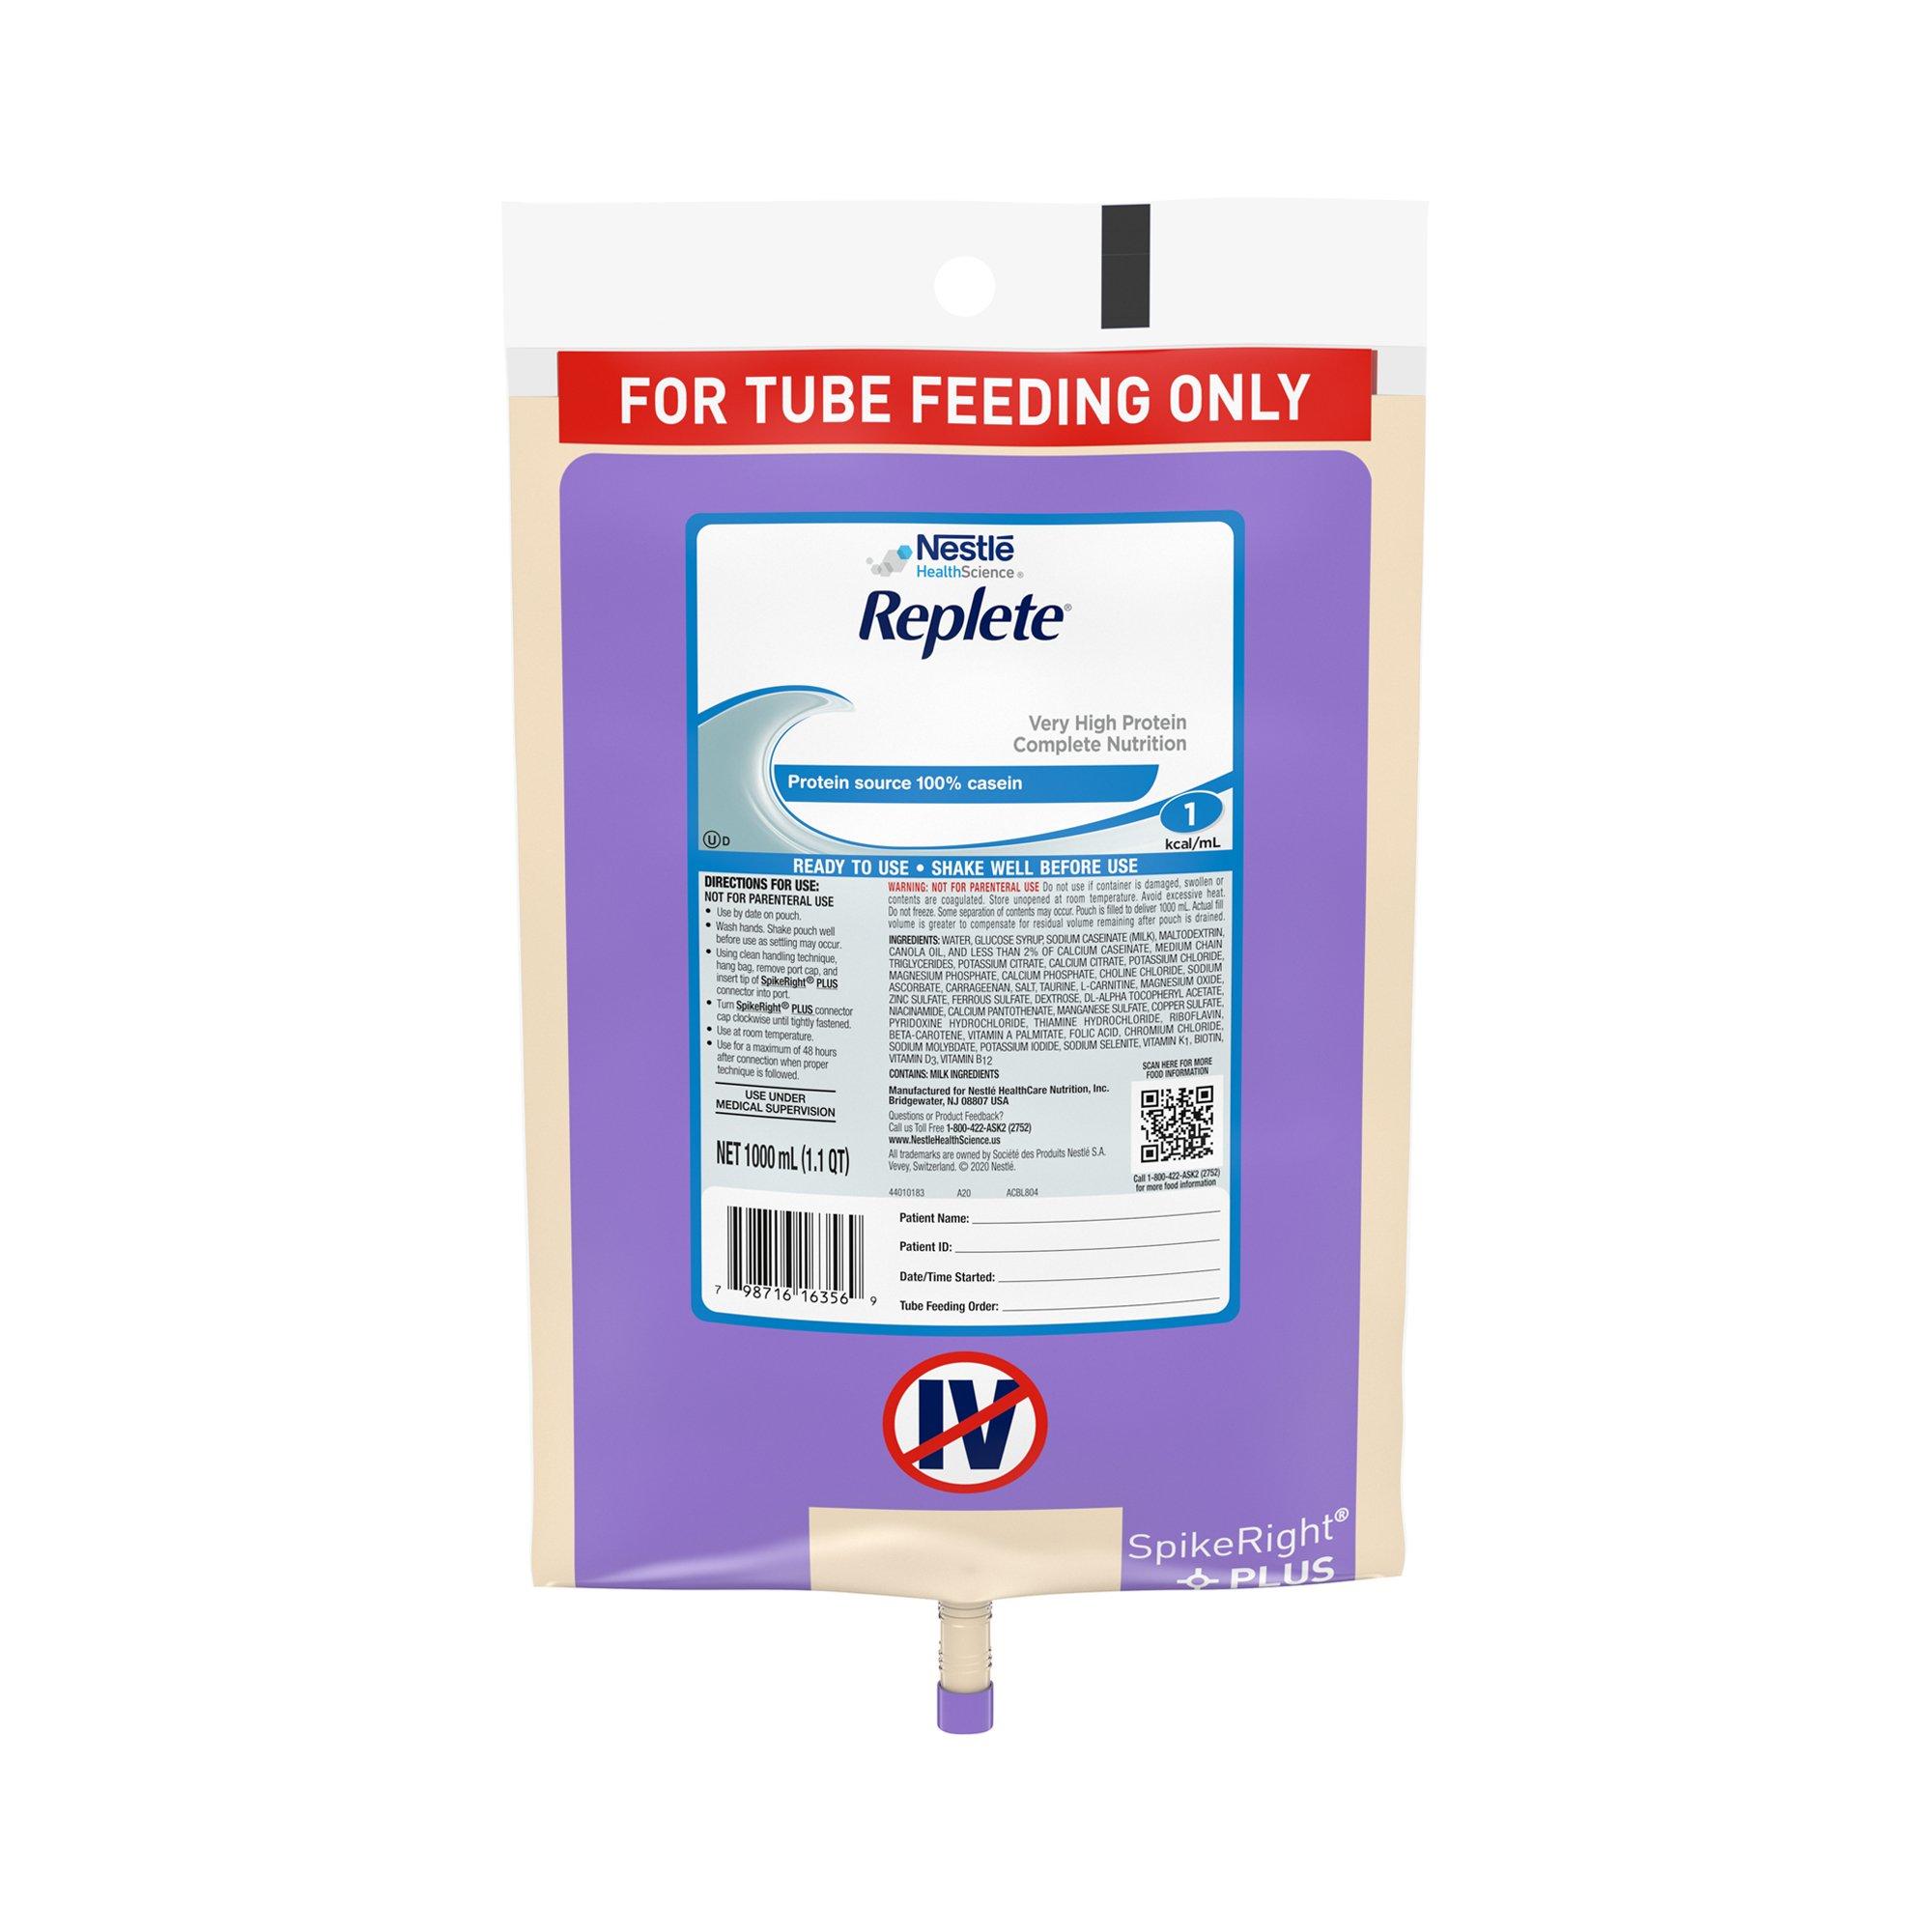 Nestle HealthScience Replete Very High Protein Complete Nutrition Tube Feeding Formula, 33.8 oz. , 10798716263563, 1 Each